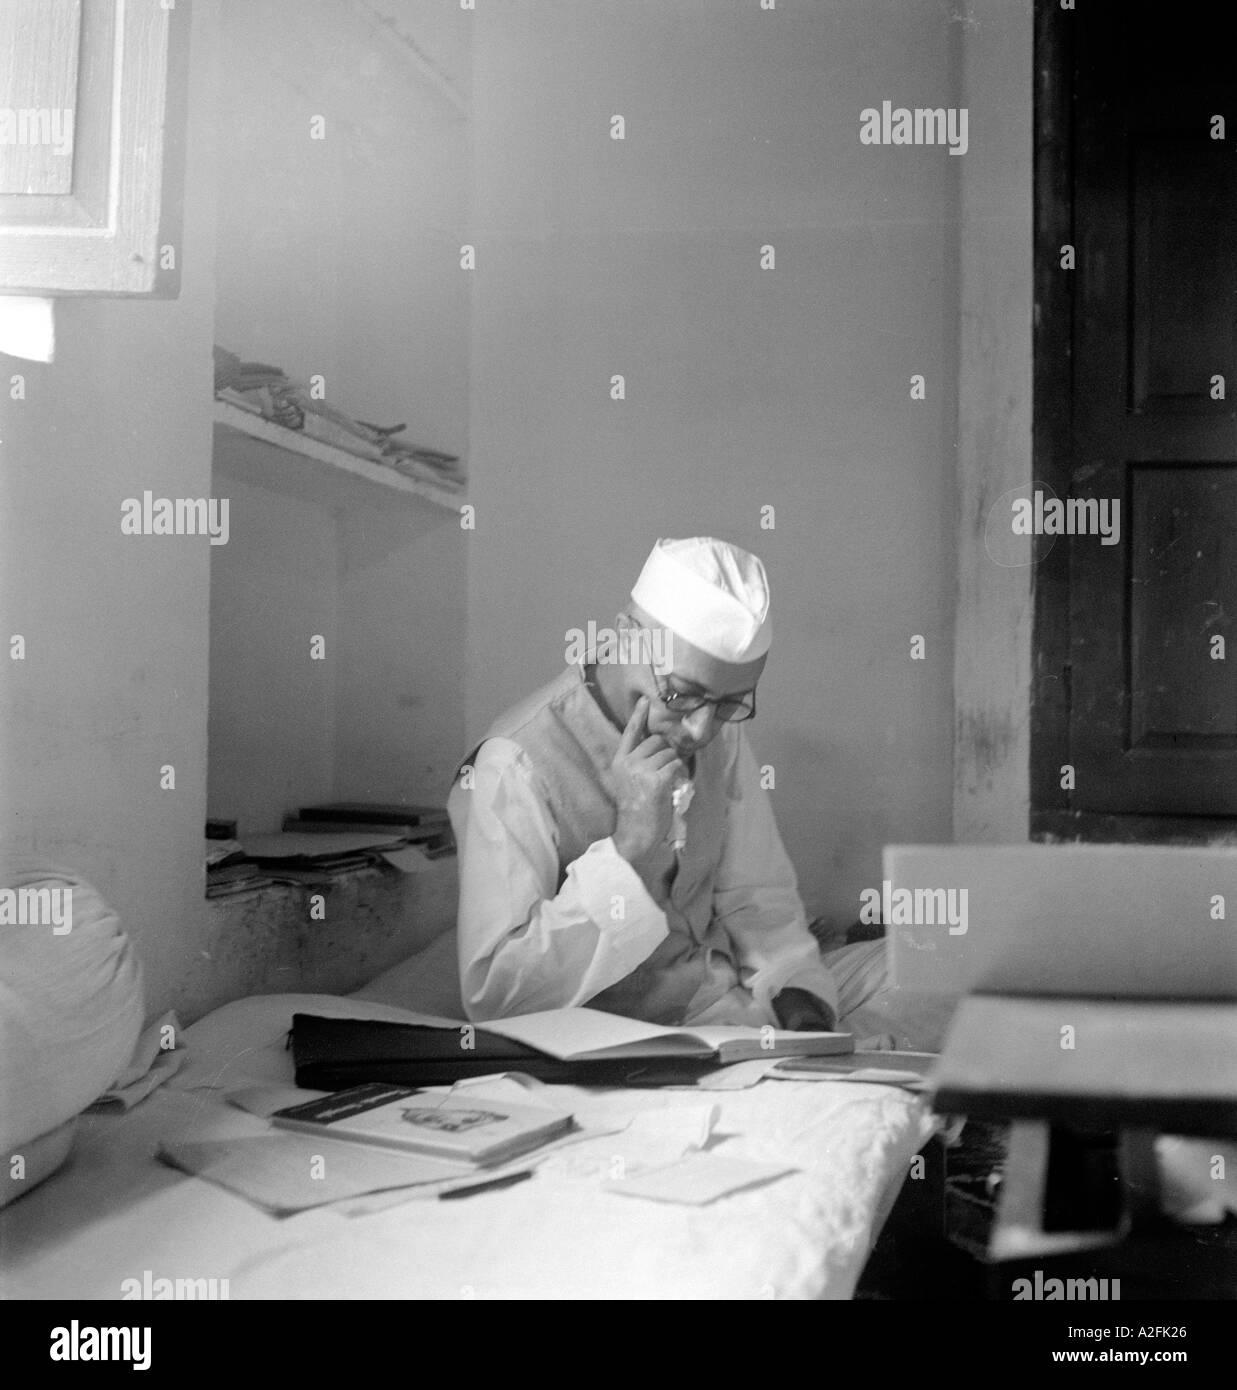 Jawaharlal Nehru in jacket cap sitting thinking reading on mattress at Bhangi Sweepers Colony New Delhi India 2 October 1946 - Stock Image